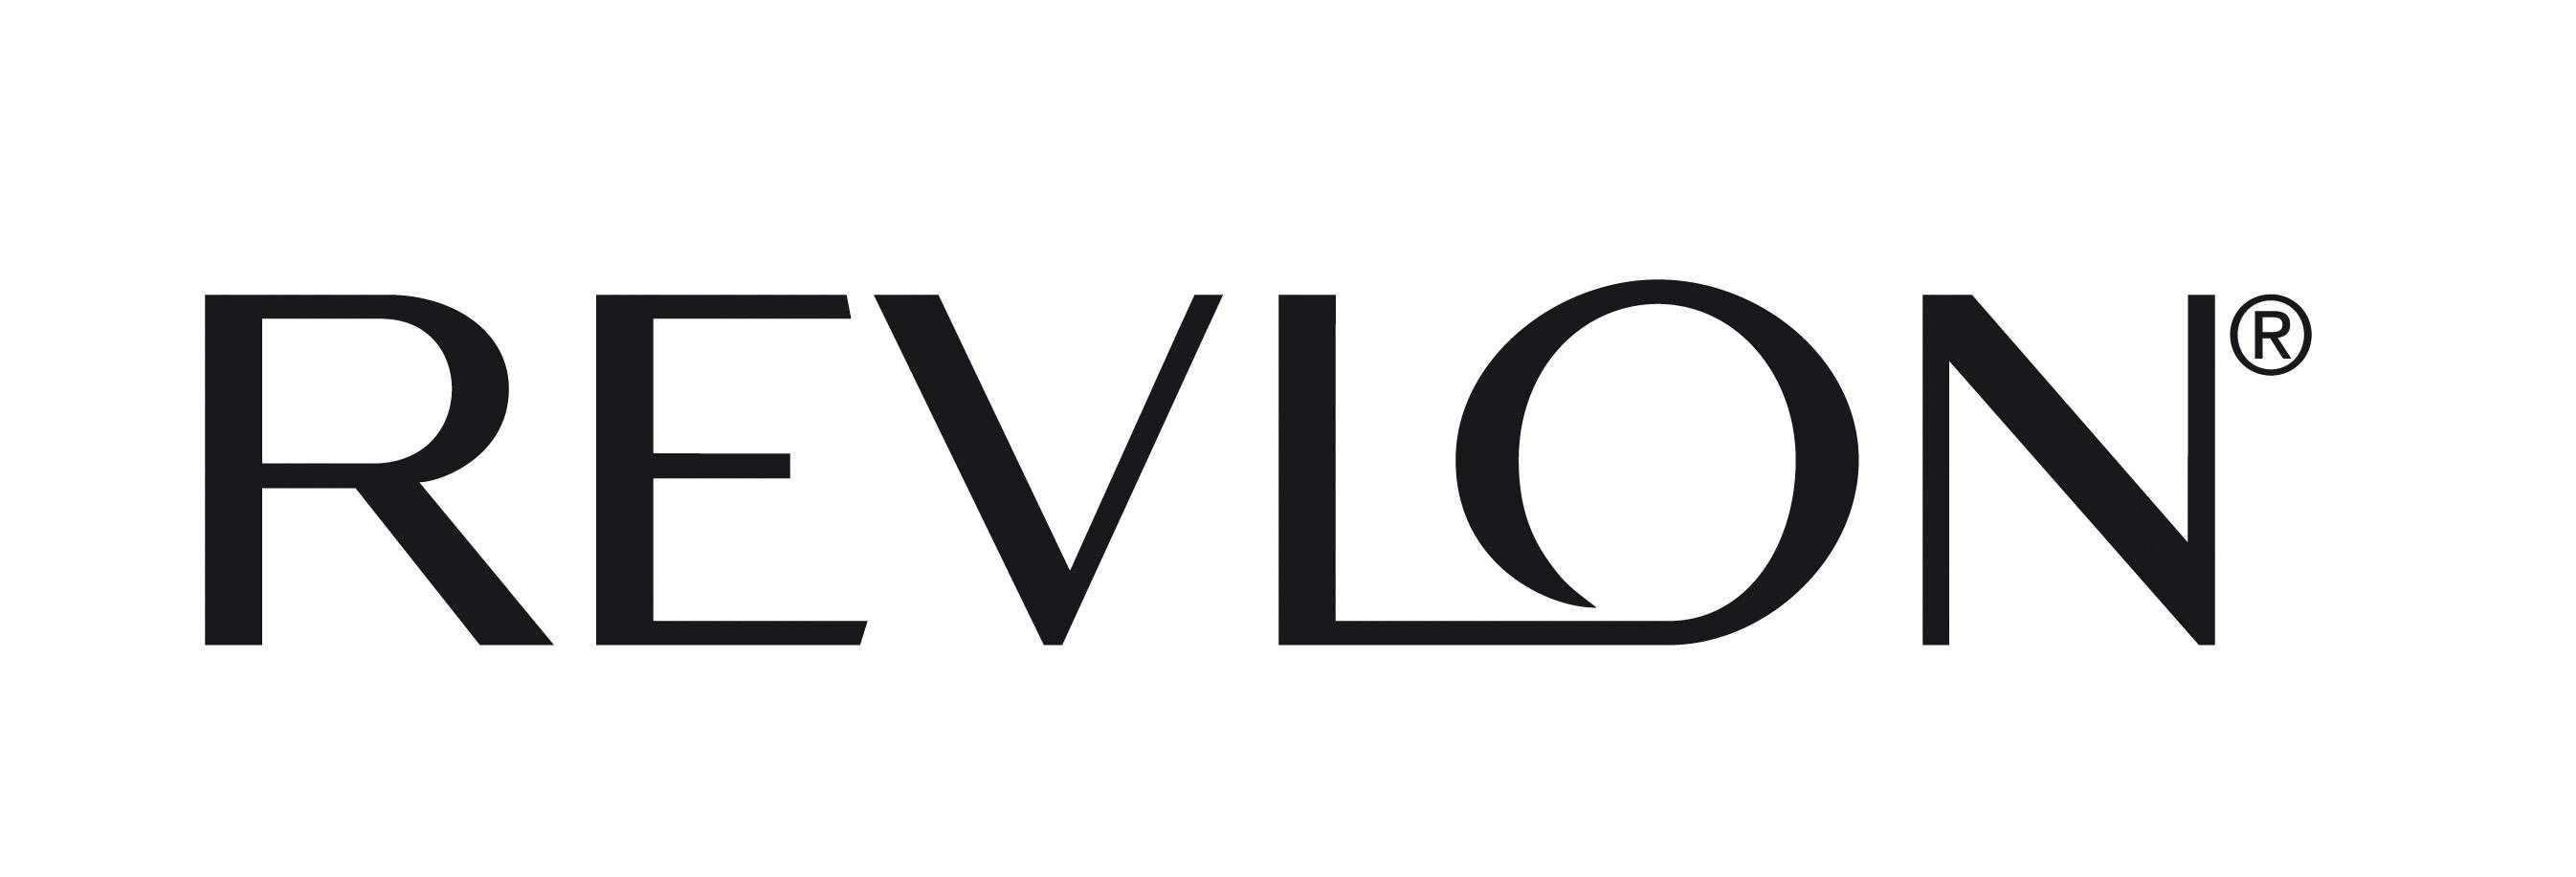 image revlon logo jpg logopedia fandom powered by wikia rh logos wikia com revlon logo transparent revlon logo png